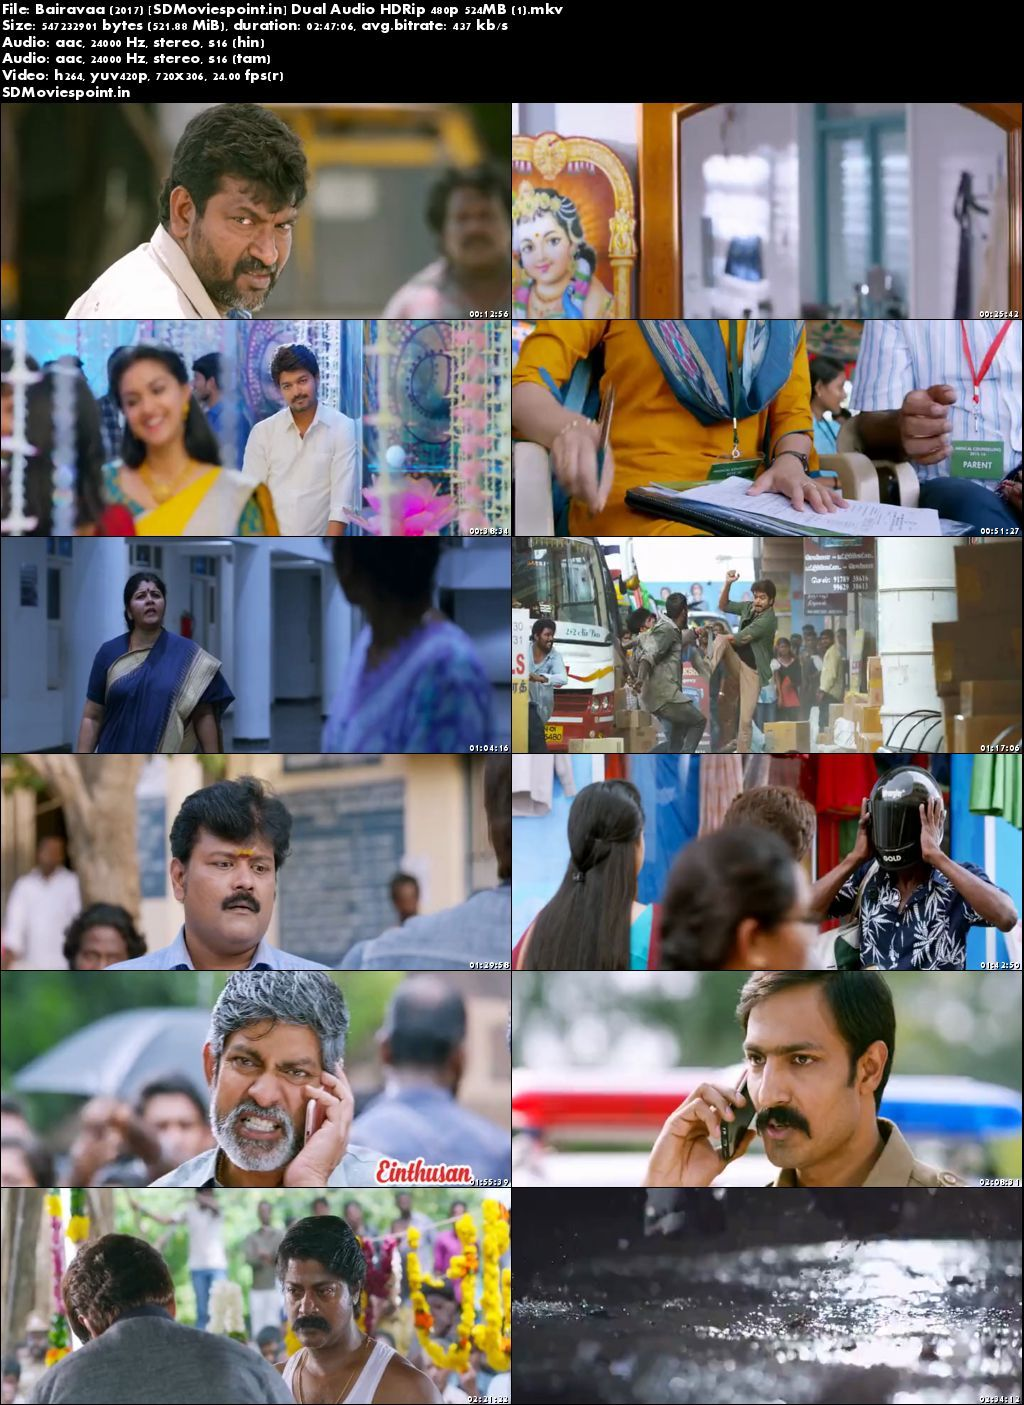 Screen Shots Bairavaa 2017 Full Movie Download in Hindi Dubbed Free 720p